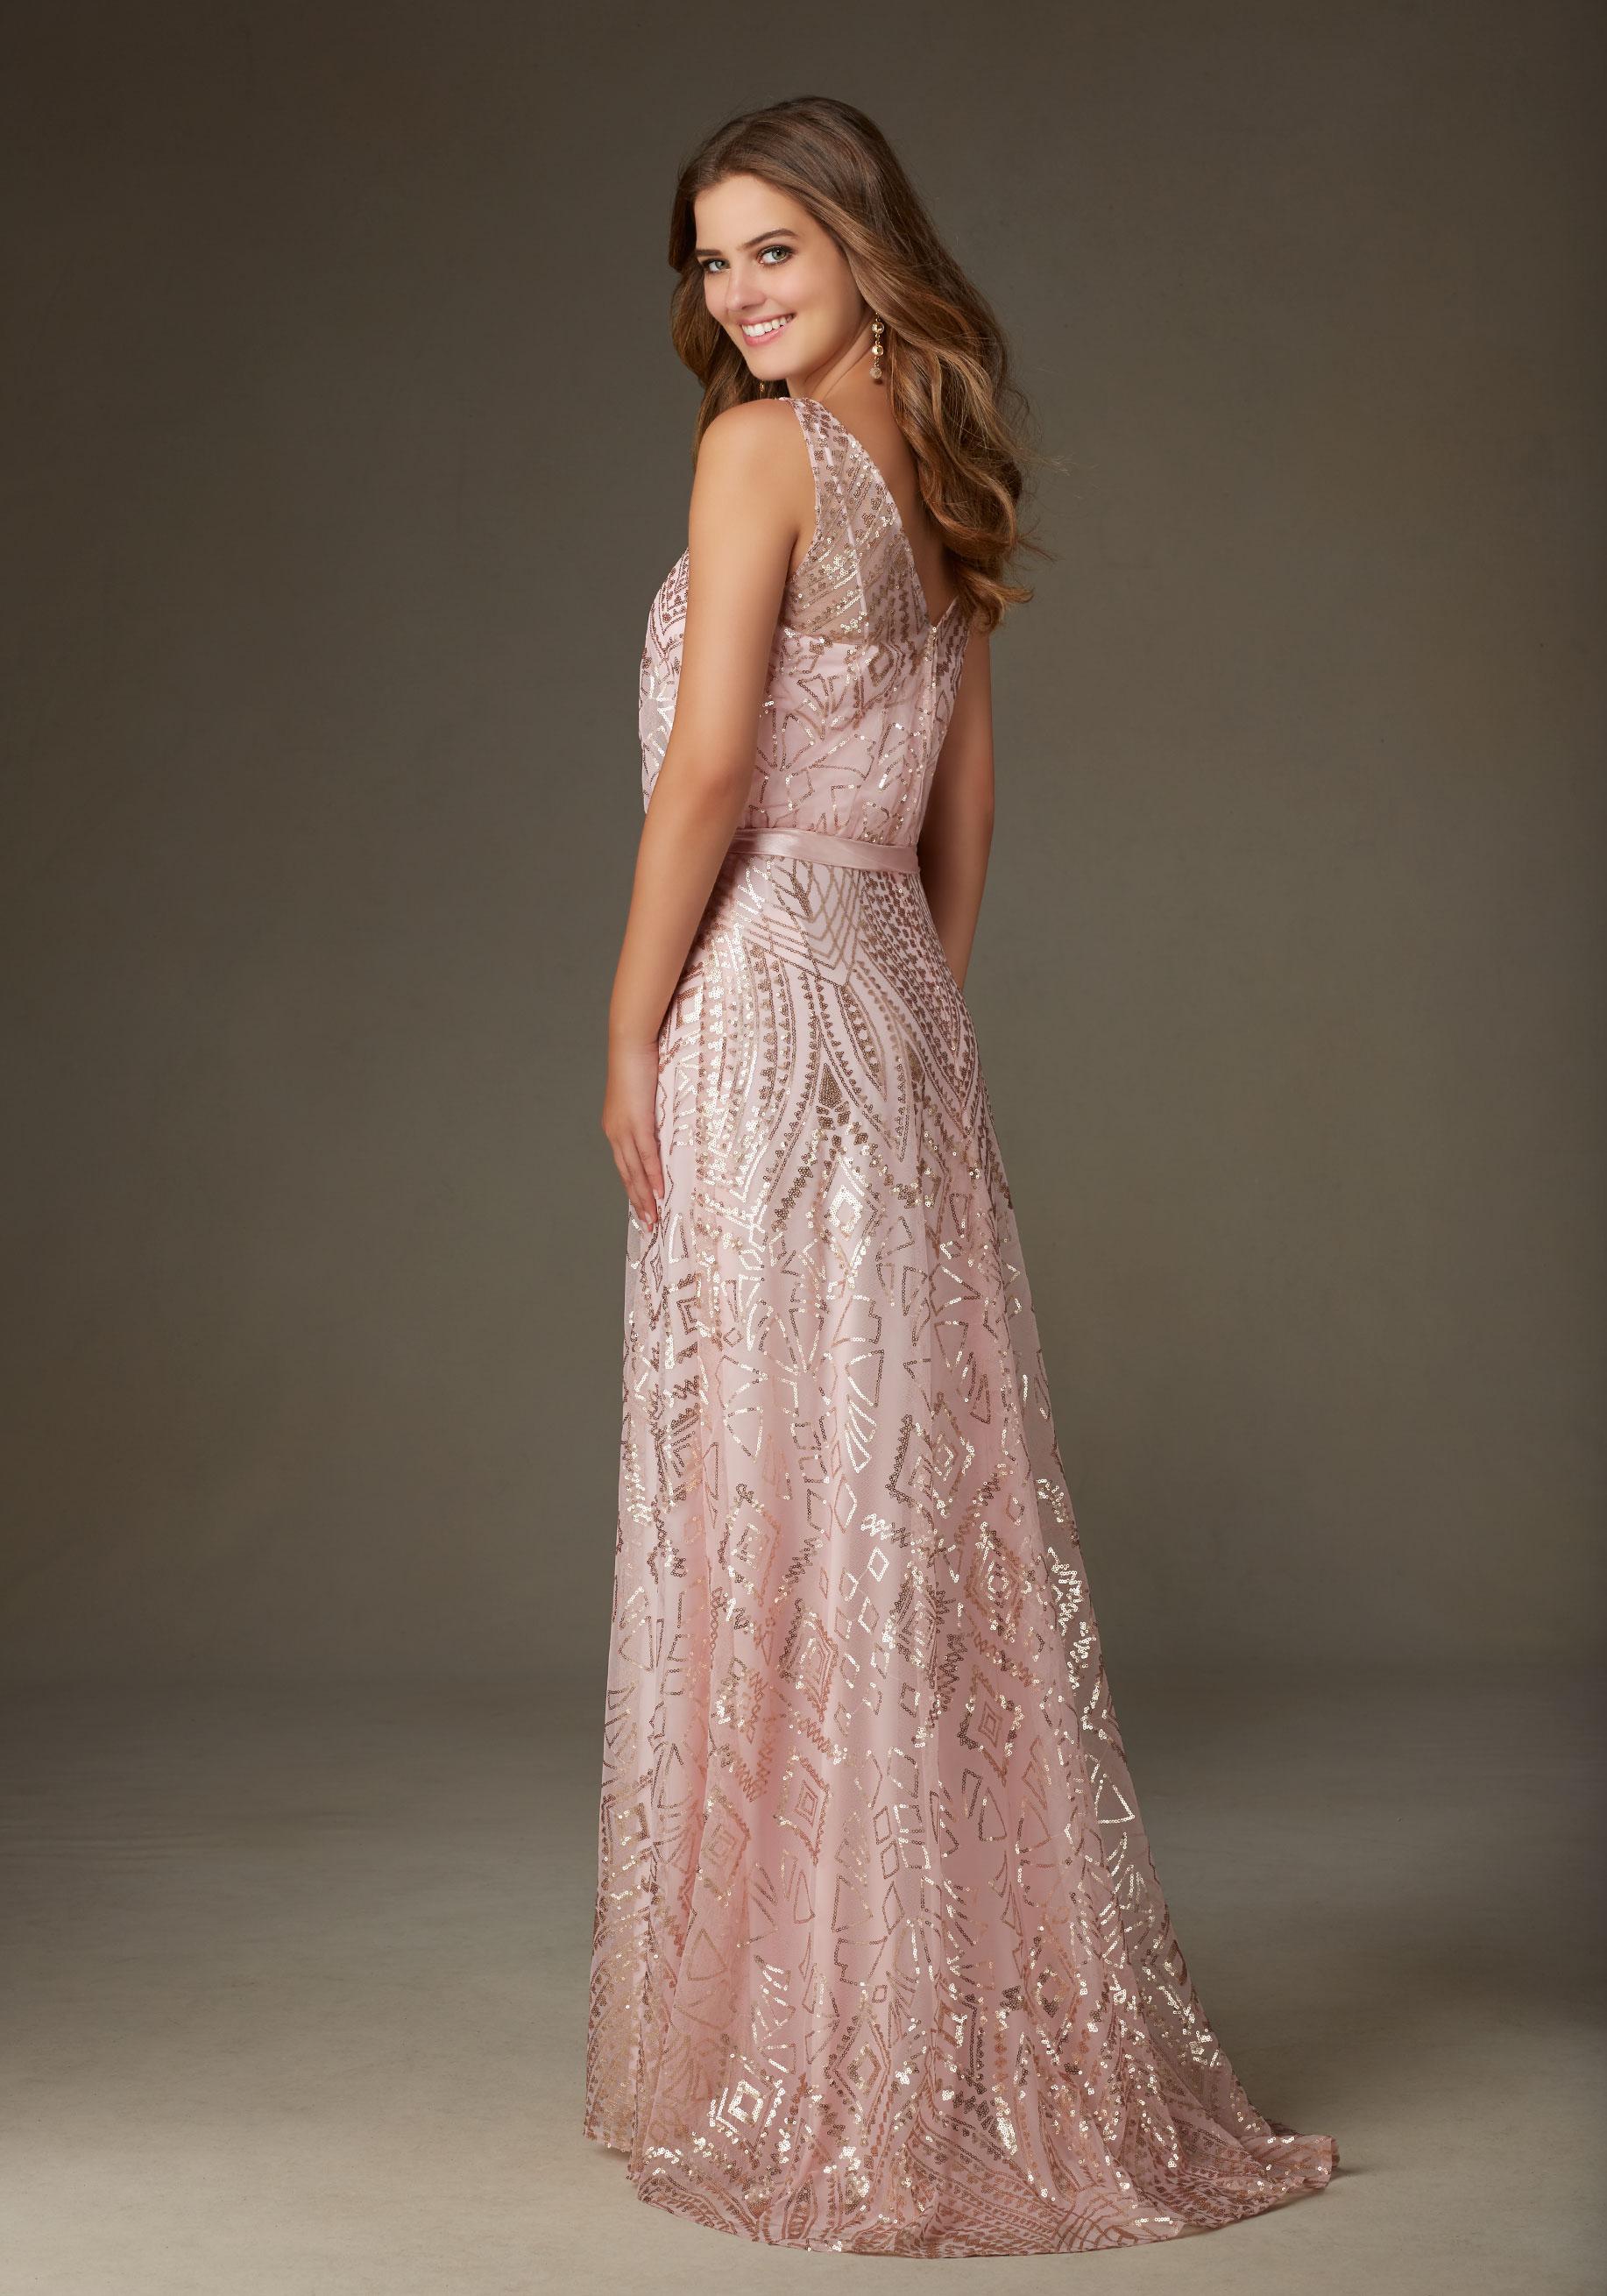 Mori Lee SKU: 20478 - VeLace Bridal - Wedding Dresses Bellingham MA